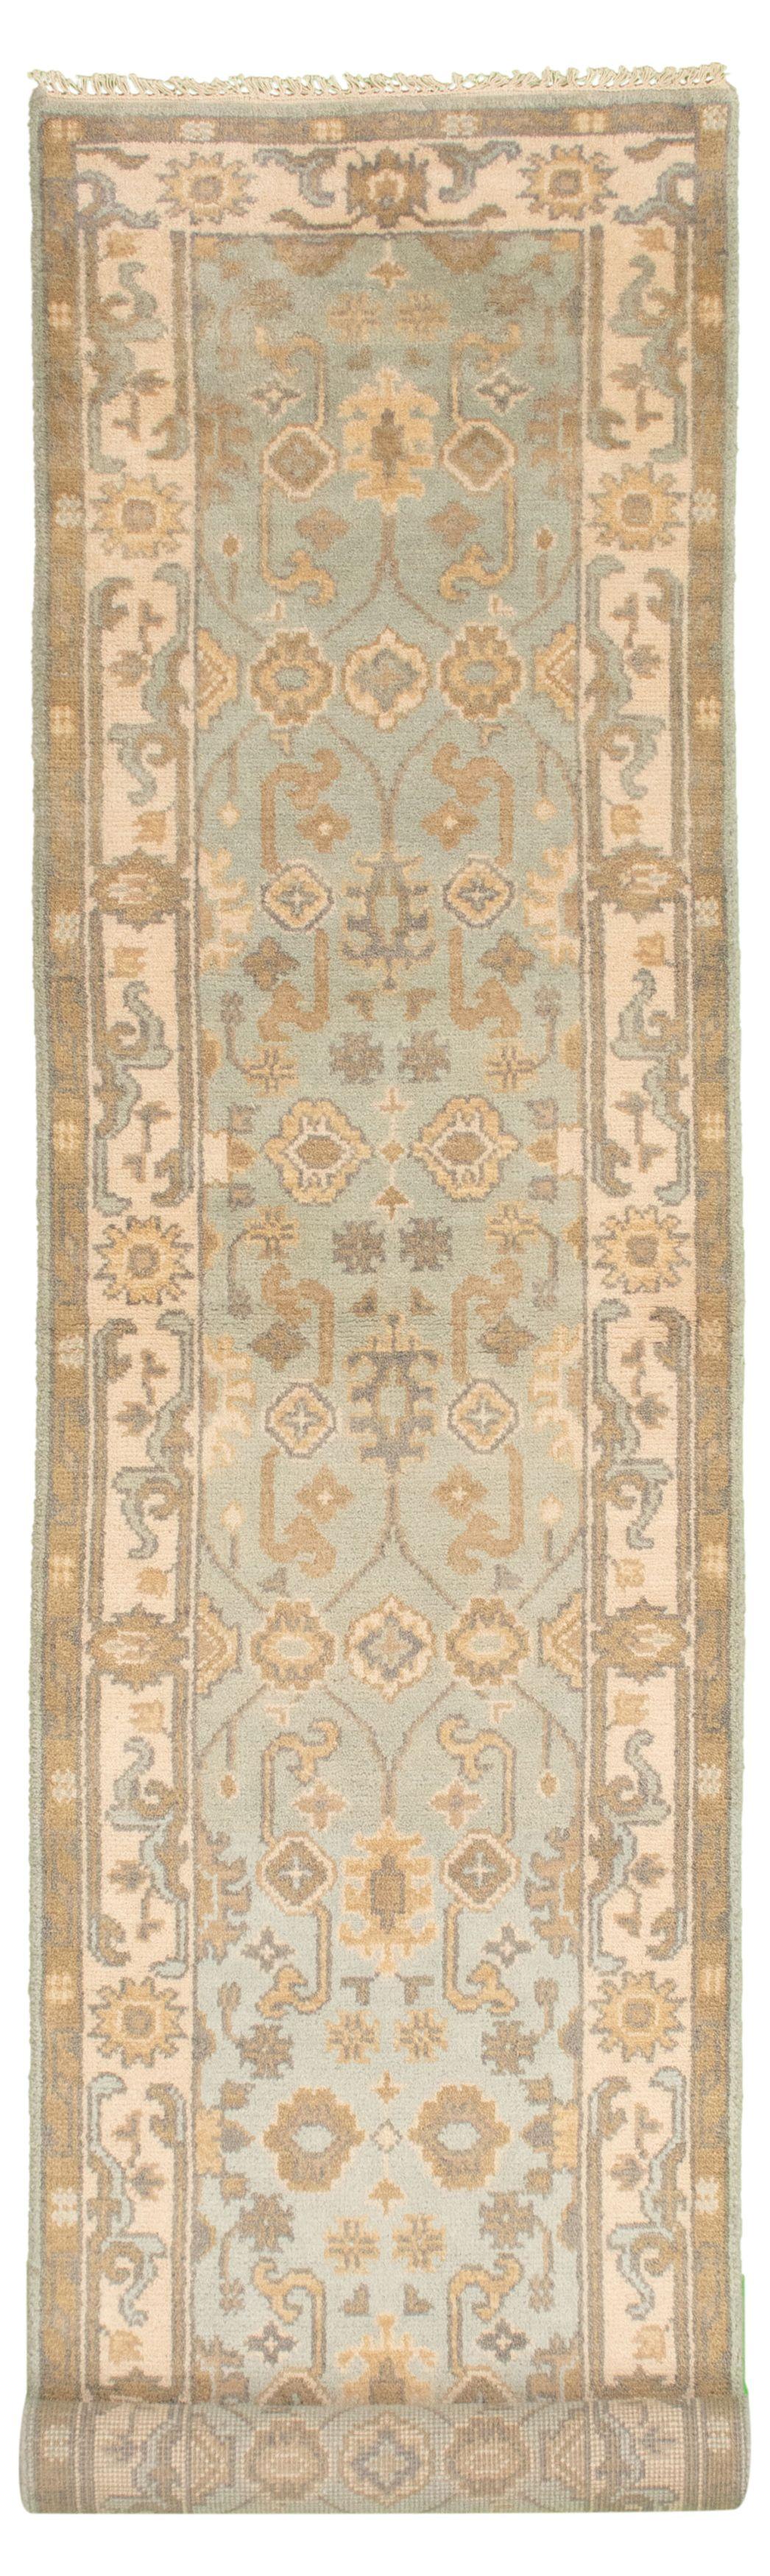 "Hand-knotted Royal Ushak Light Blue  Wool Rug 2'7"" x 11'10""  Size: 2'7"" x 11'10"""